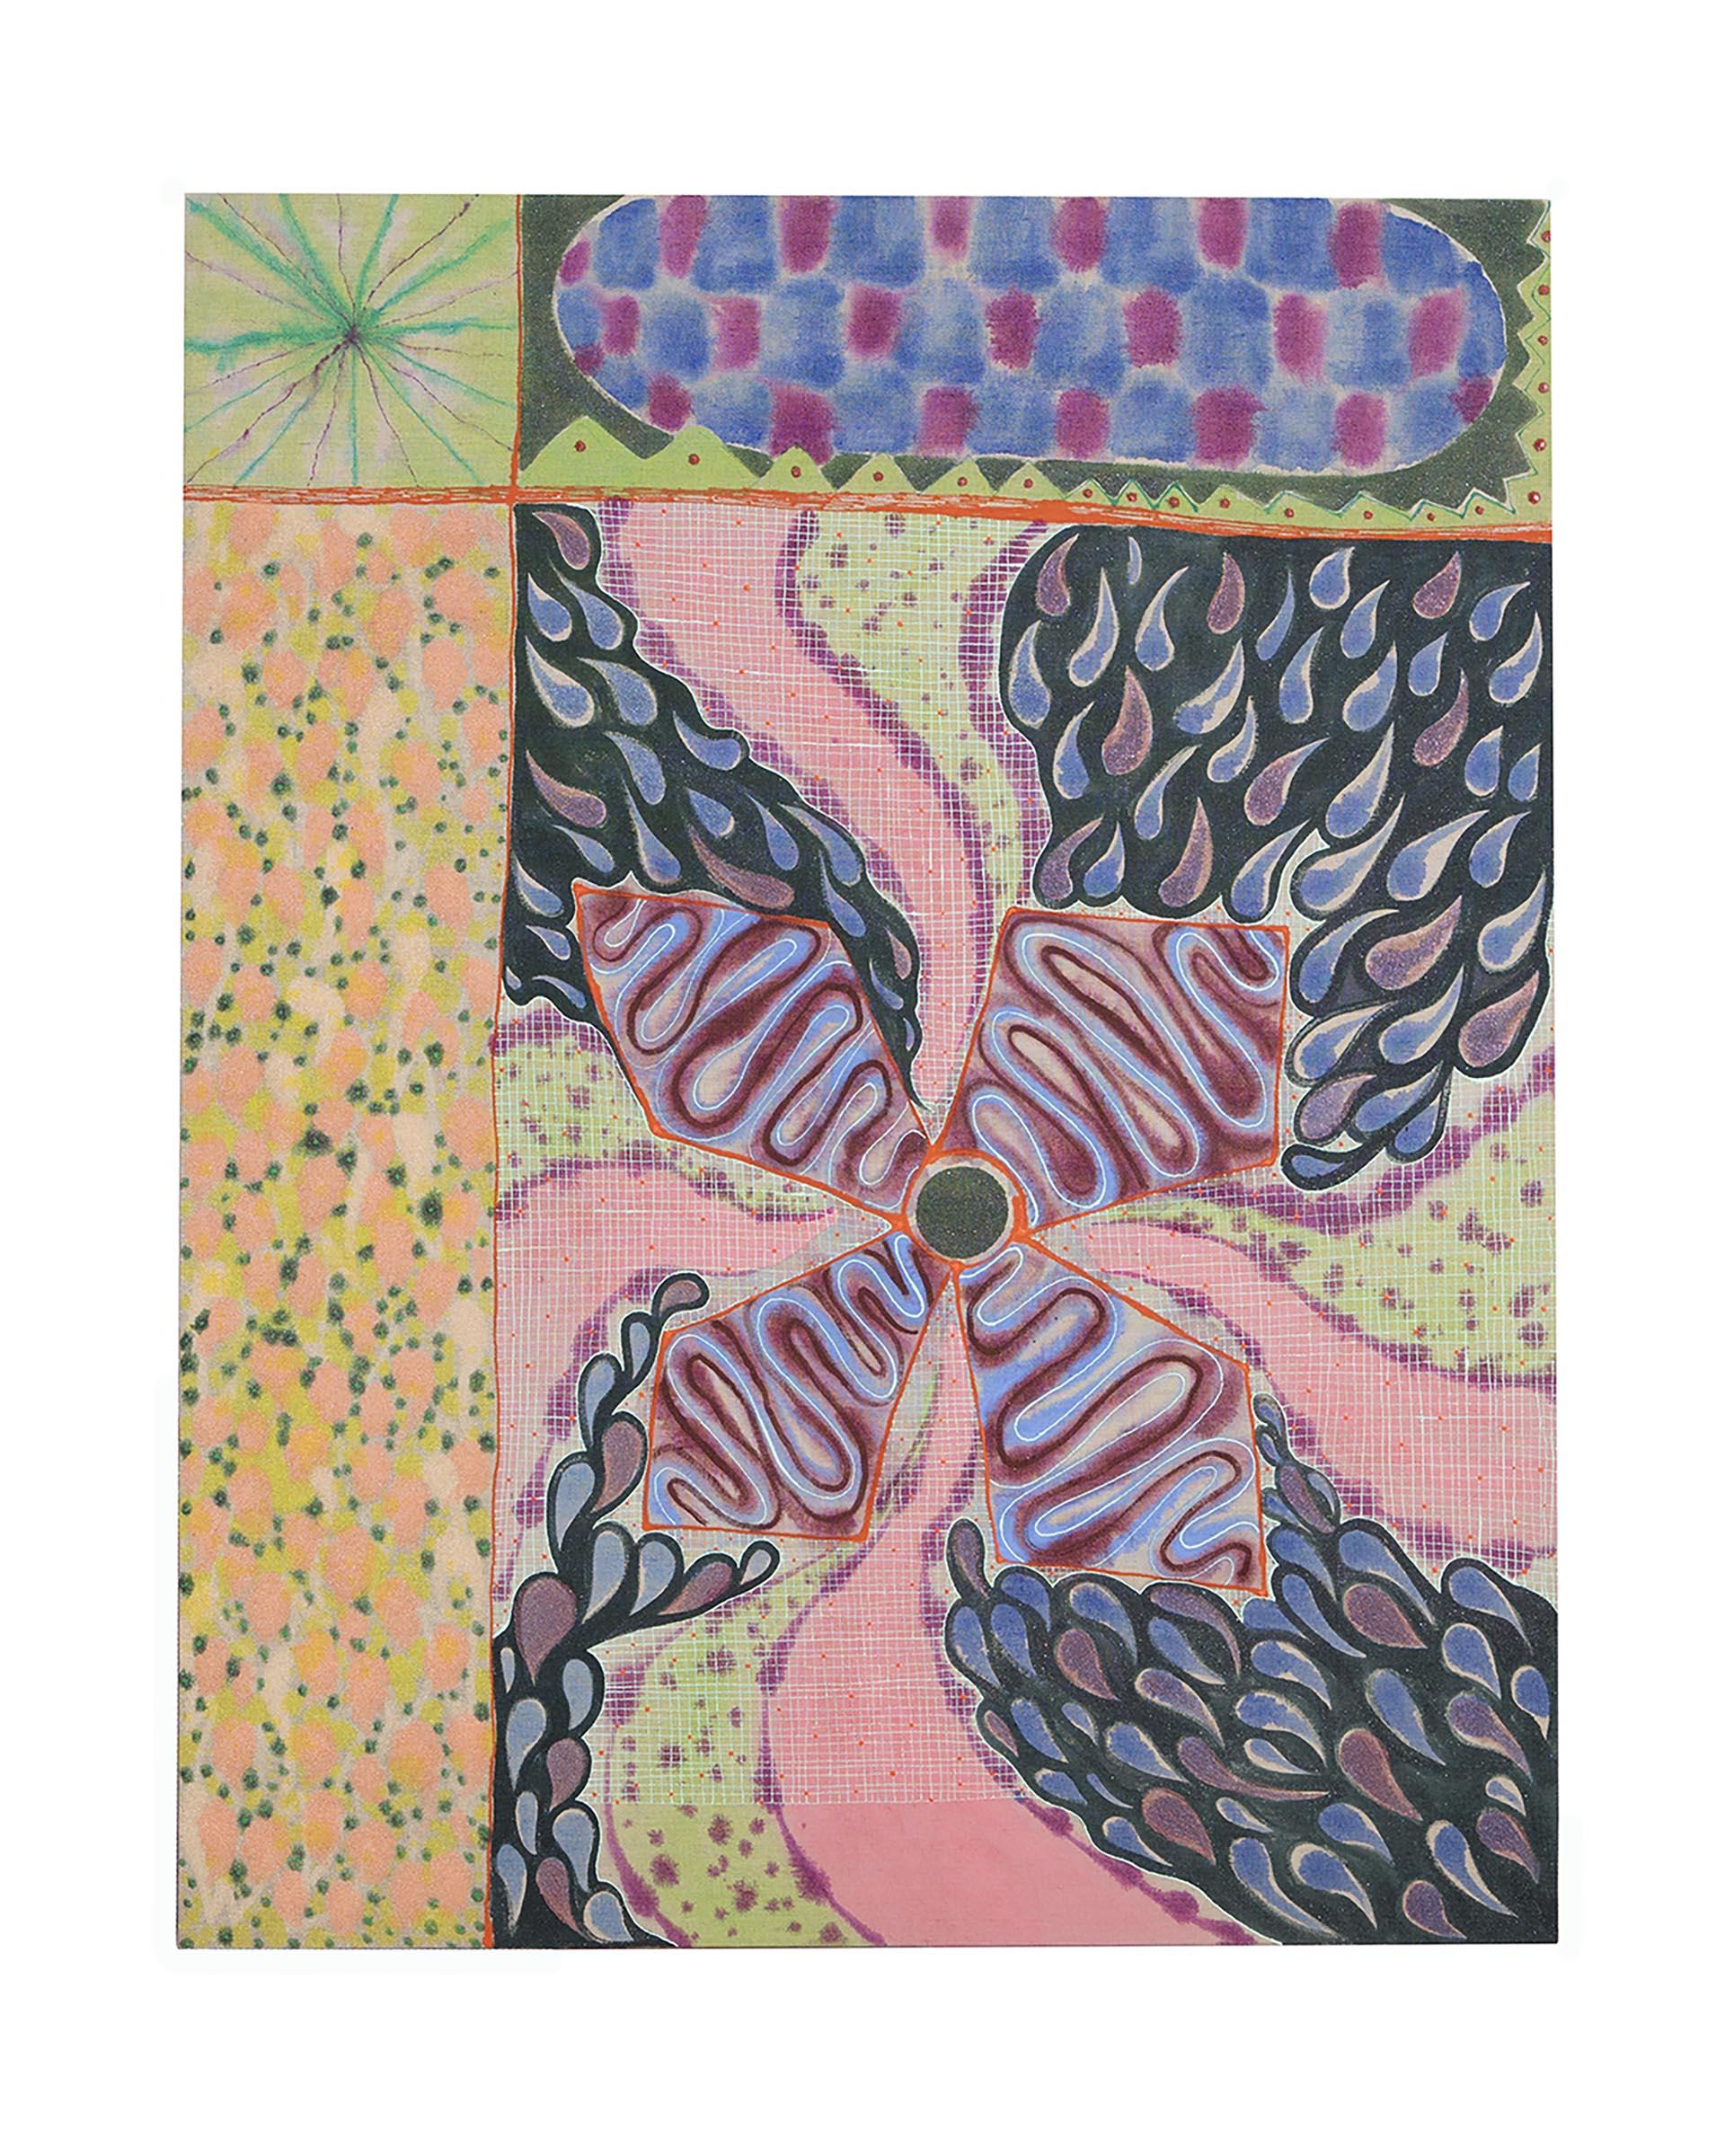 Natessa Amin, Pinwheel, Acrylic and glass beads on linen, 36